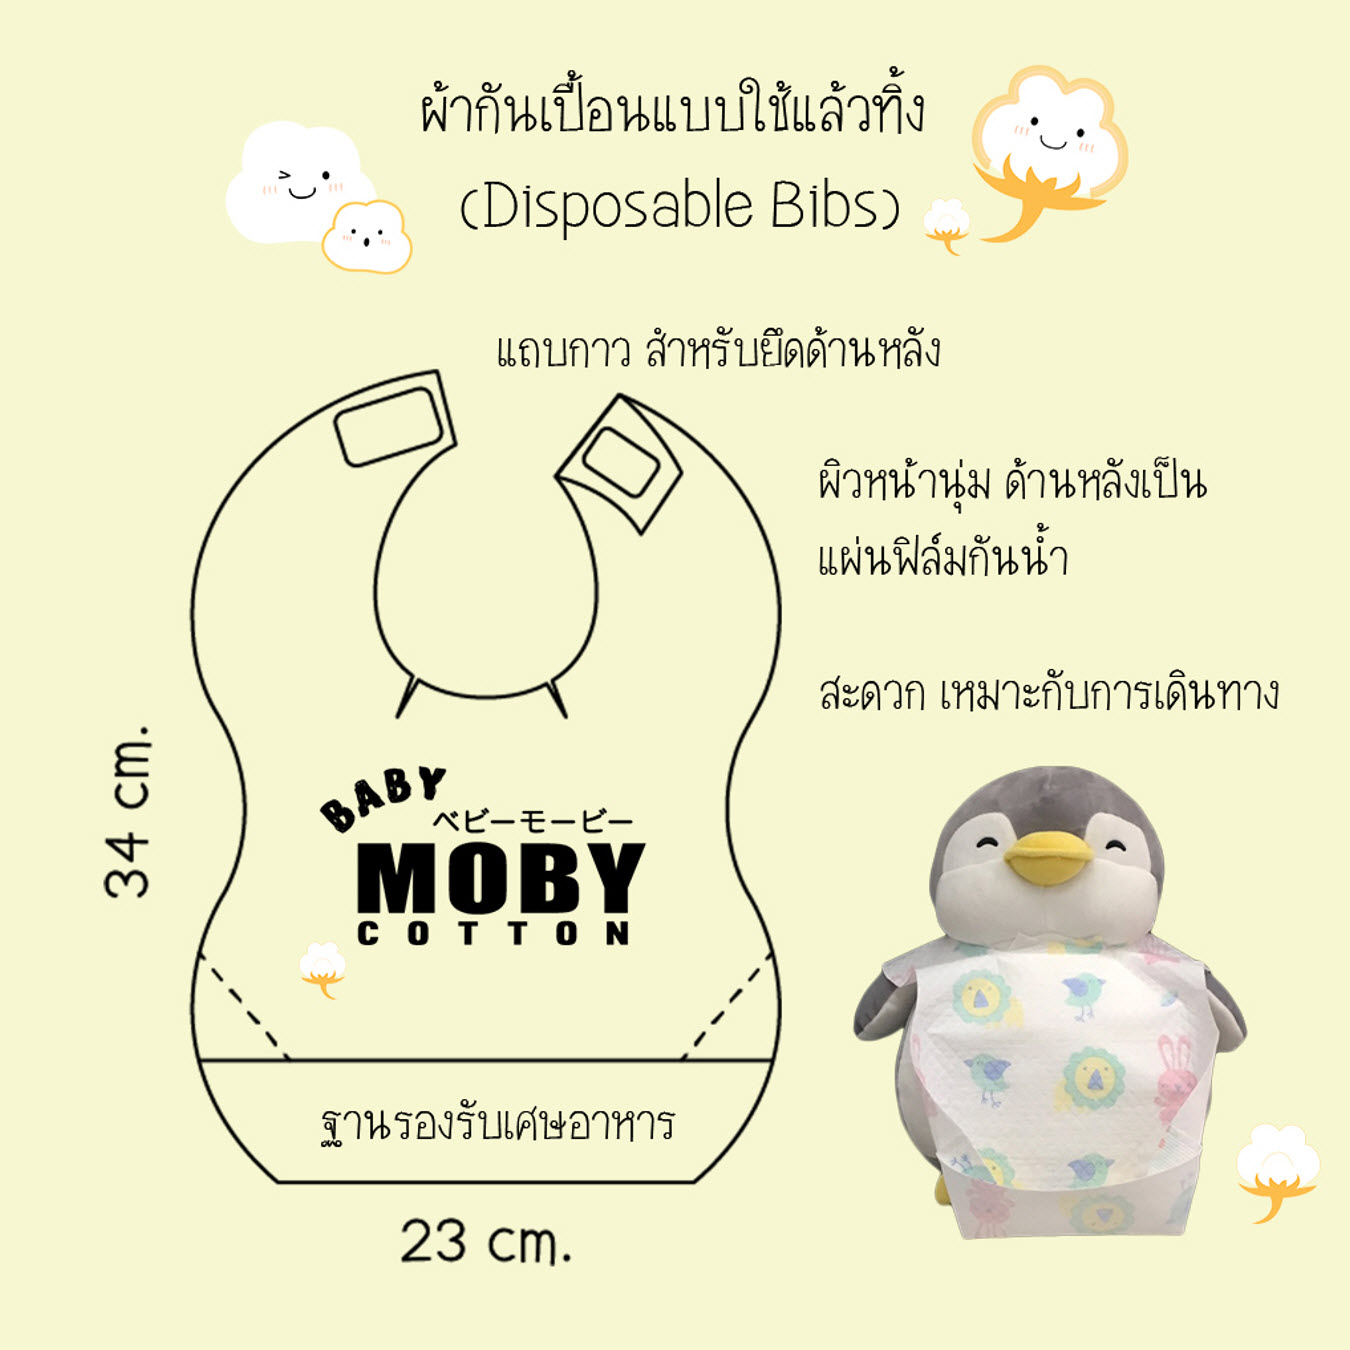 Baby Moby ผ้ากันเปื้อน แบบใช้แล้วทิ้ง Disposable Baby Bibs